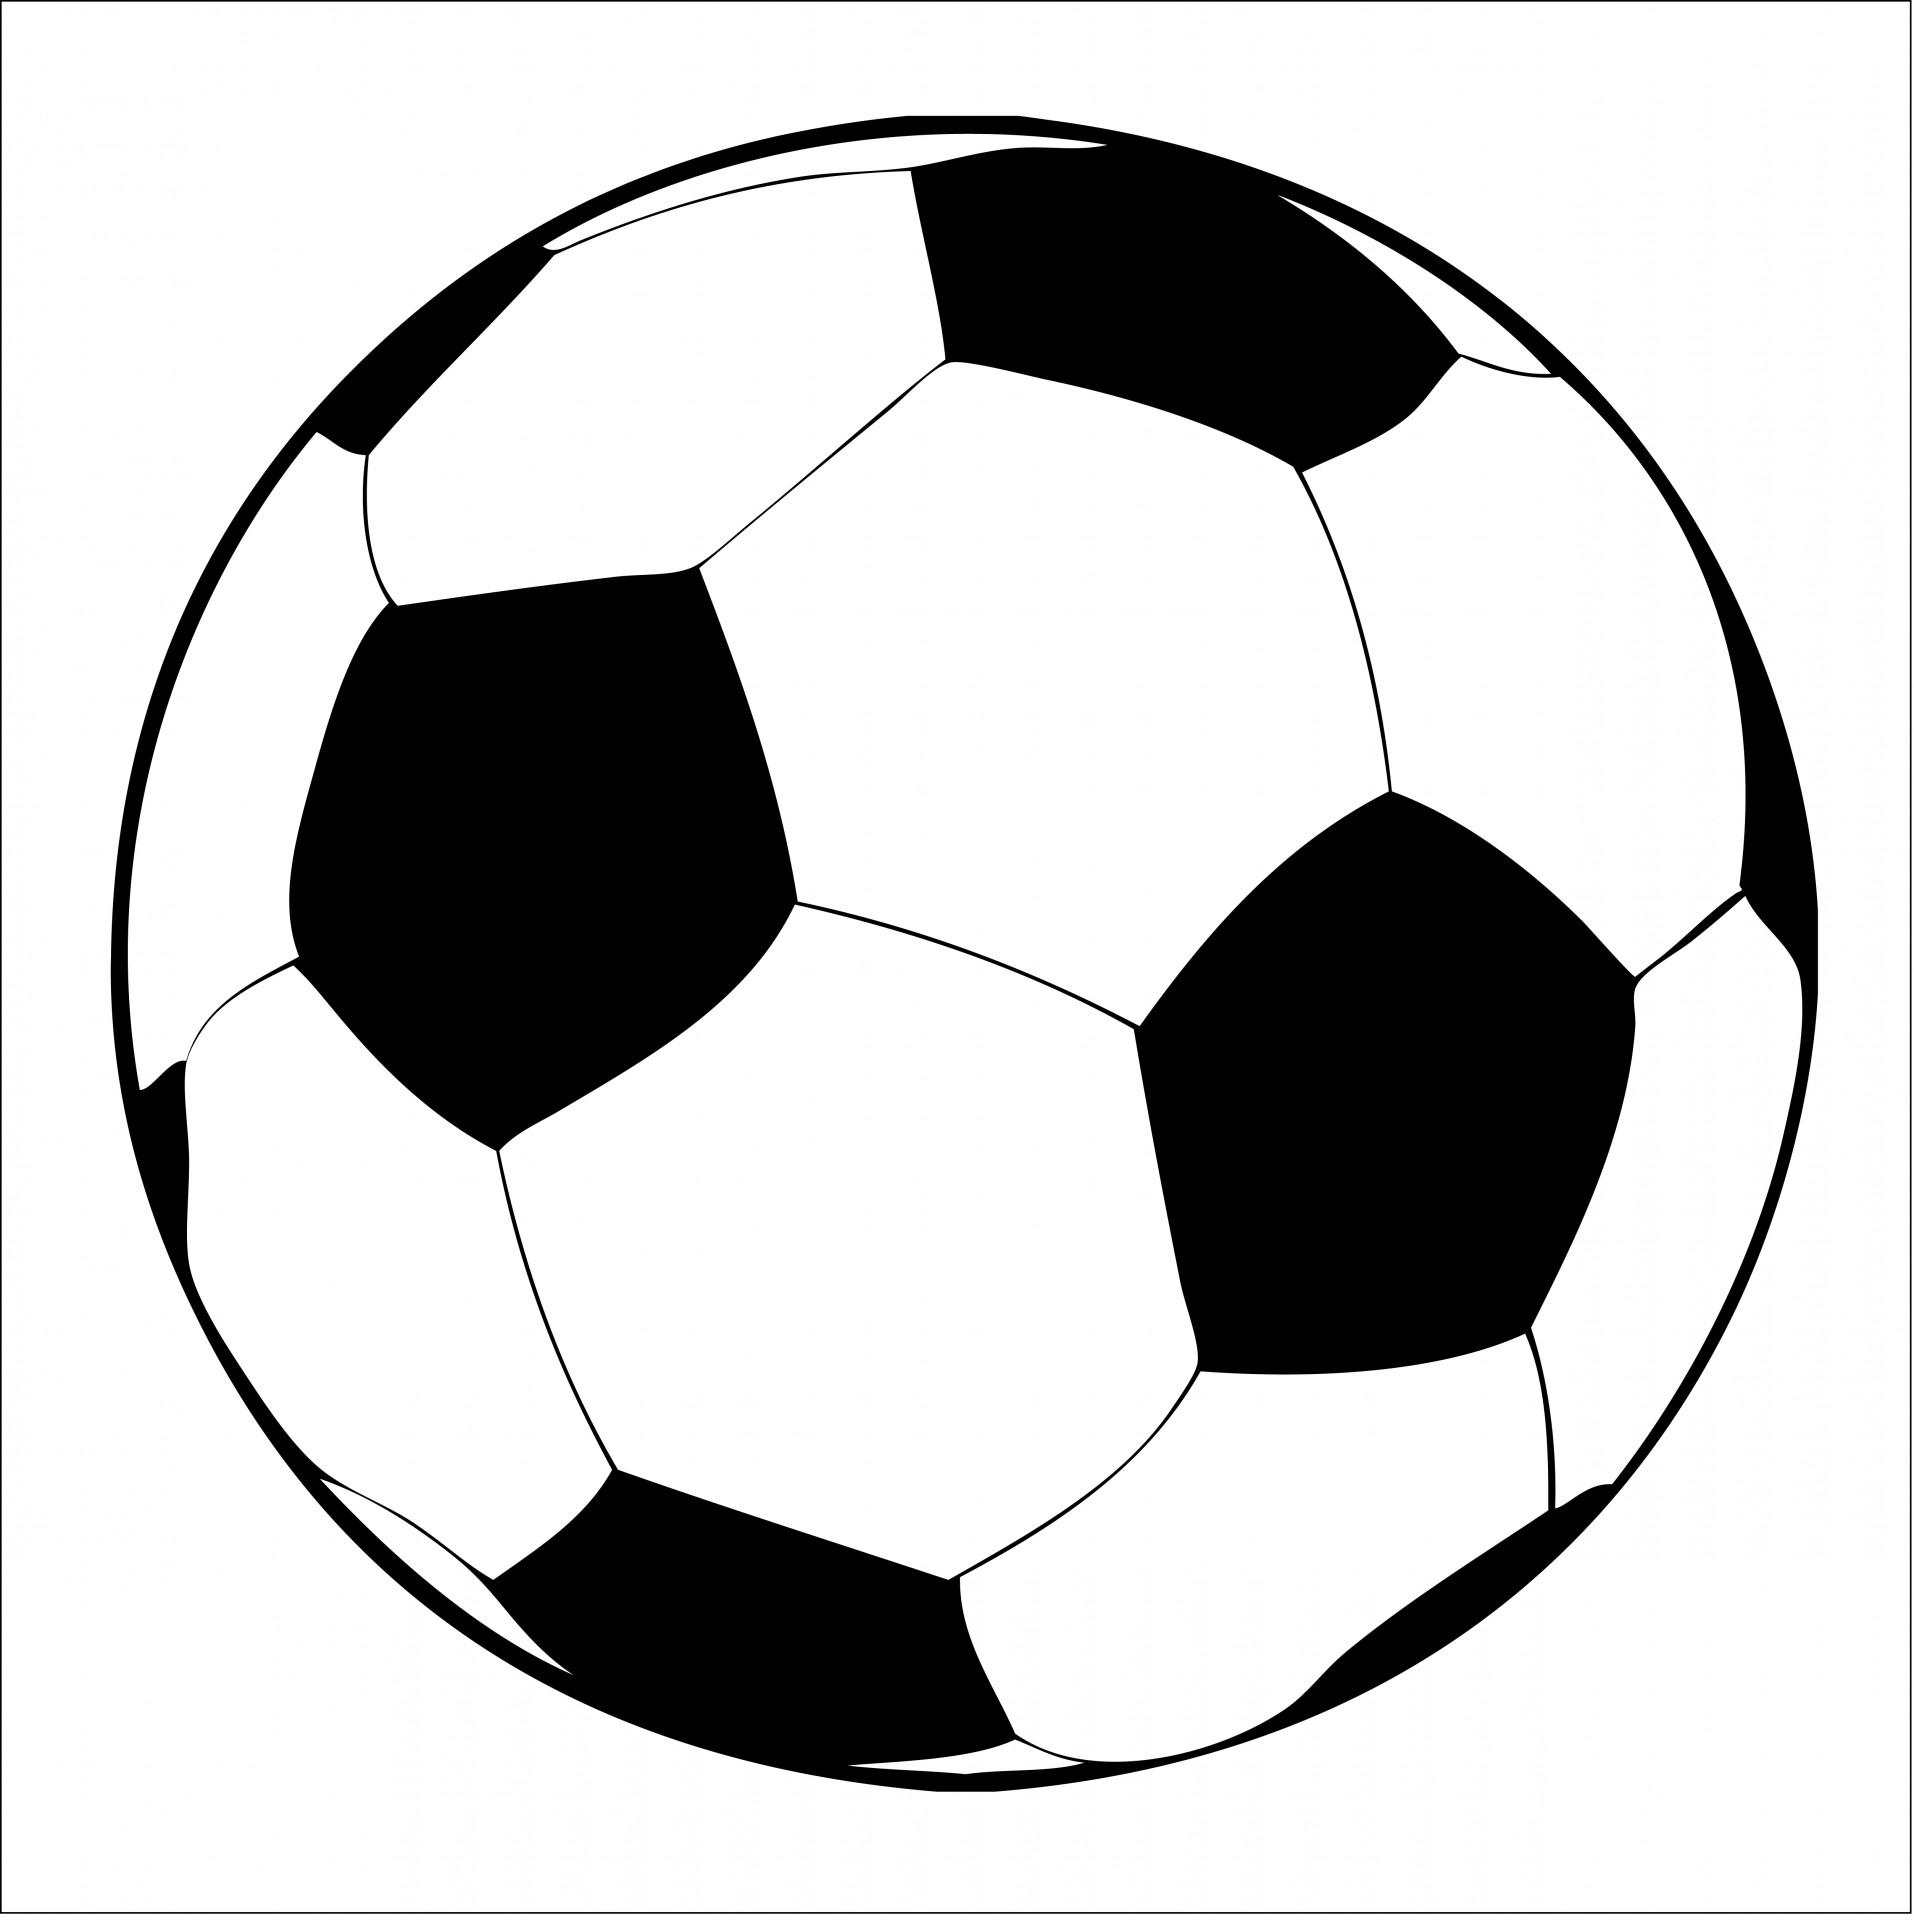 Soccer Ball Clipart Free Stock Photo